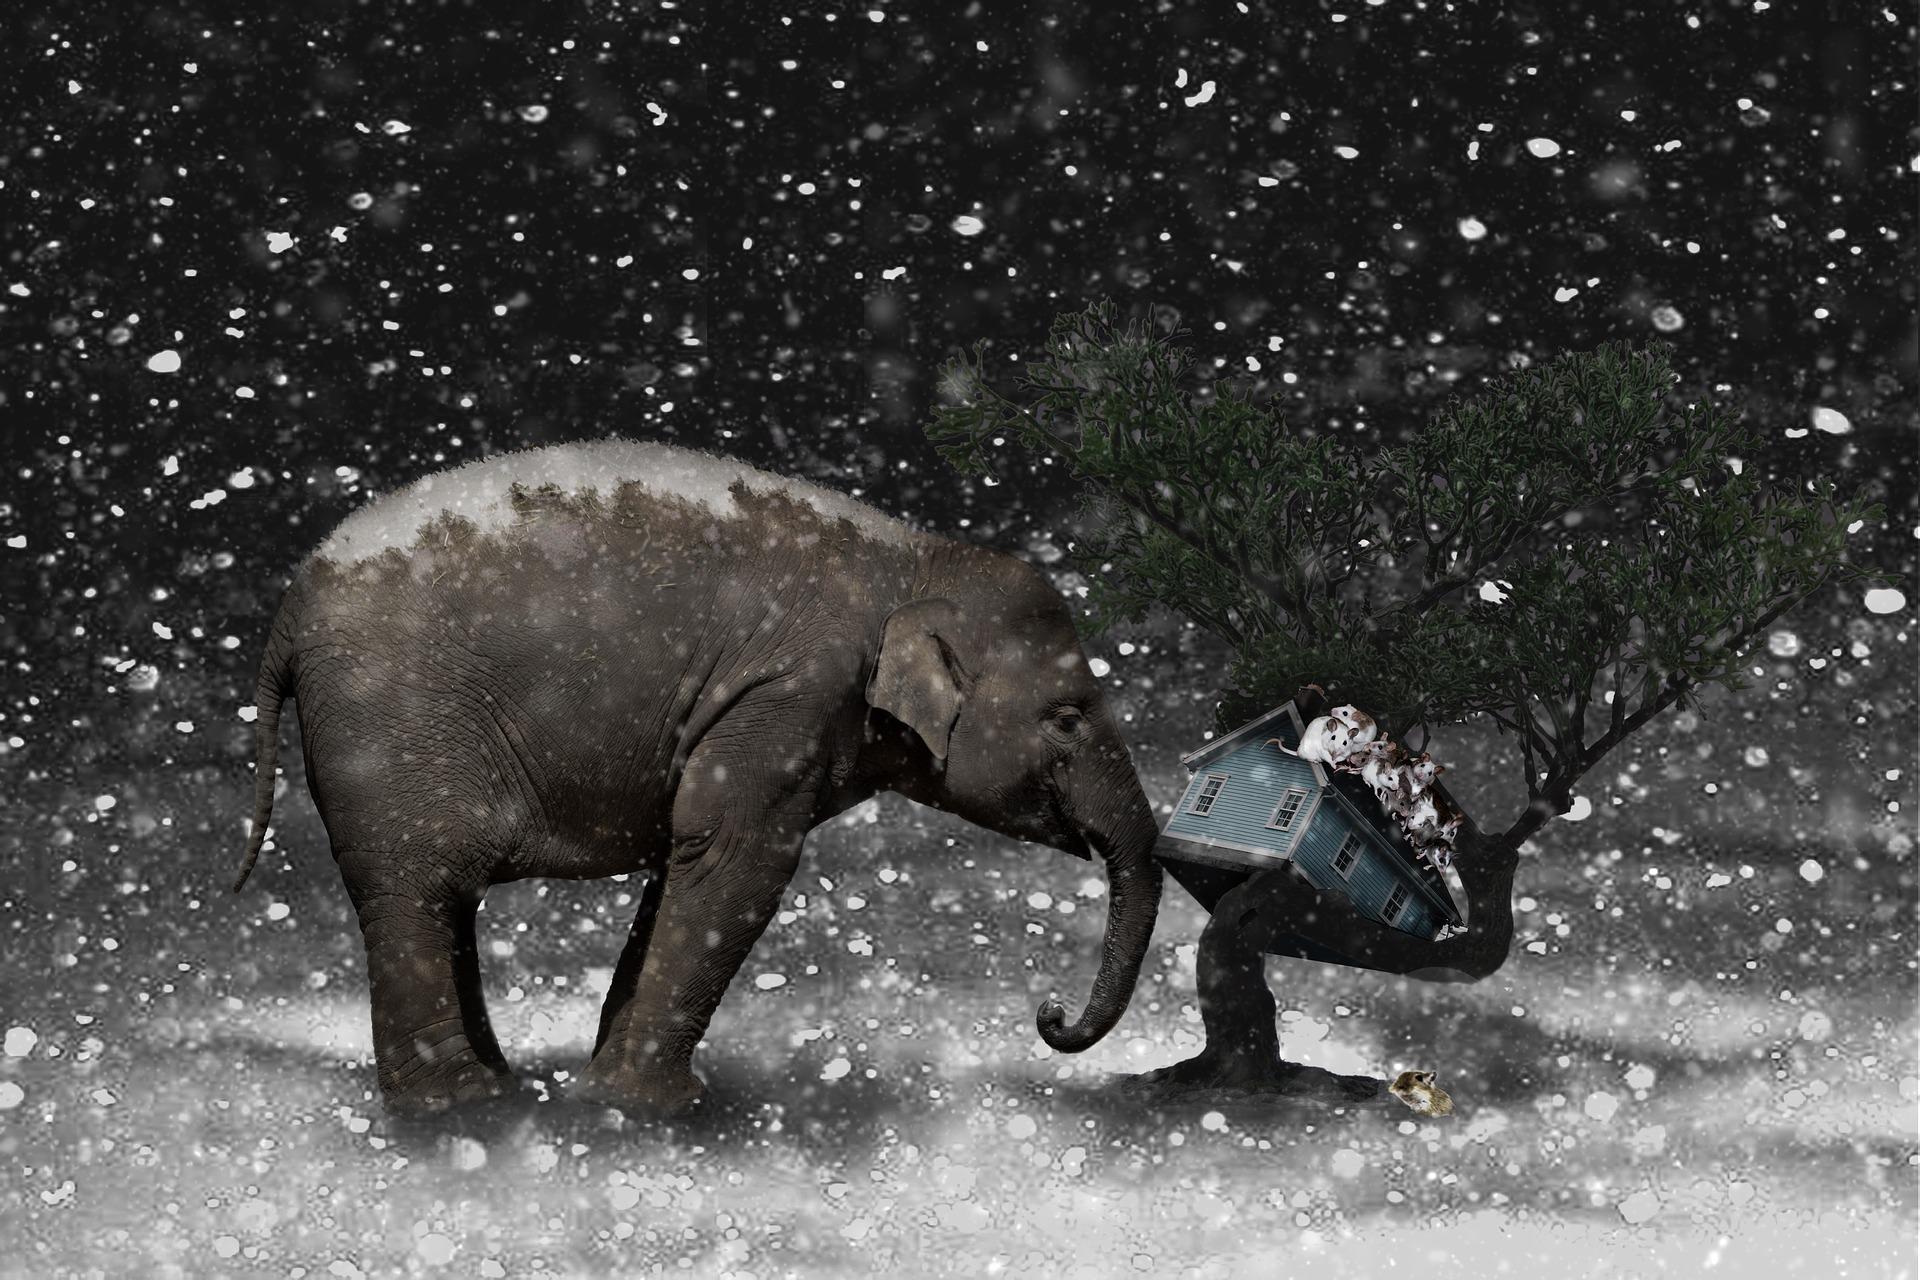 elephant-2910293_1920